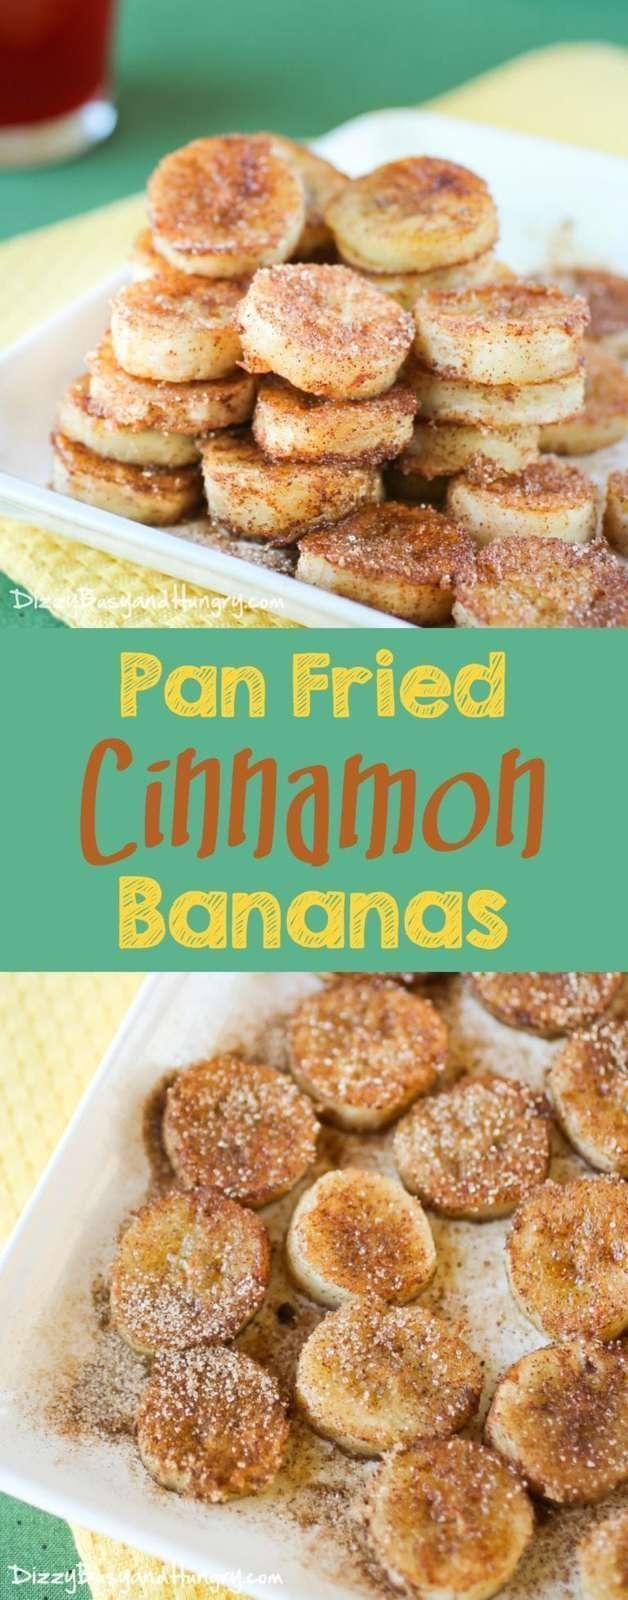 Pan Fried Cinnamon Bananas | DizzyBusyandHungry.com - Ricetta semplice e veloce per ...  #bananas #cinnamon #dizzybusyandhungry #fried #ricetta #semplice #veloce #Easy Recipes casserole